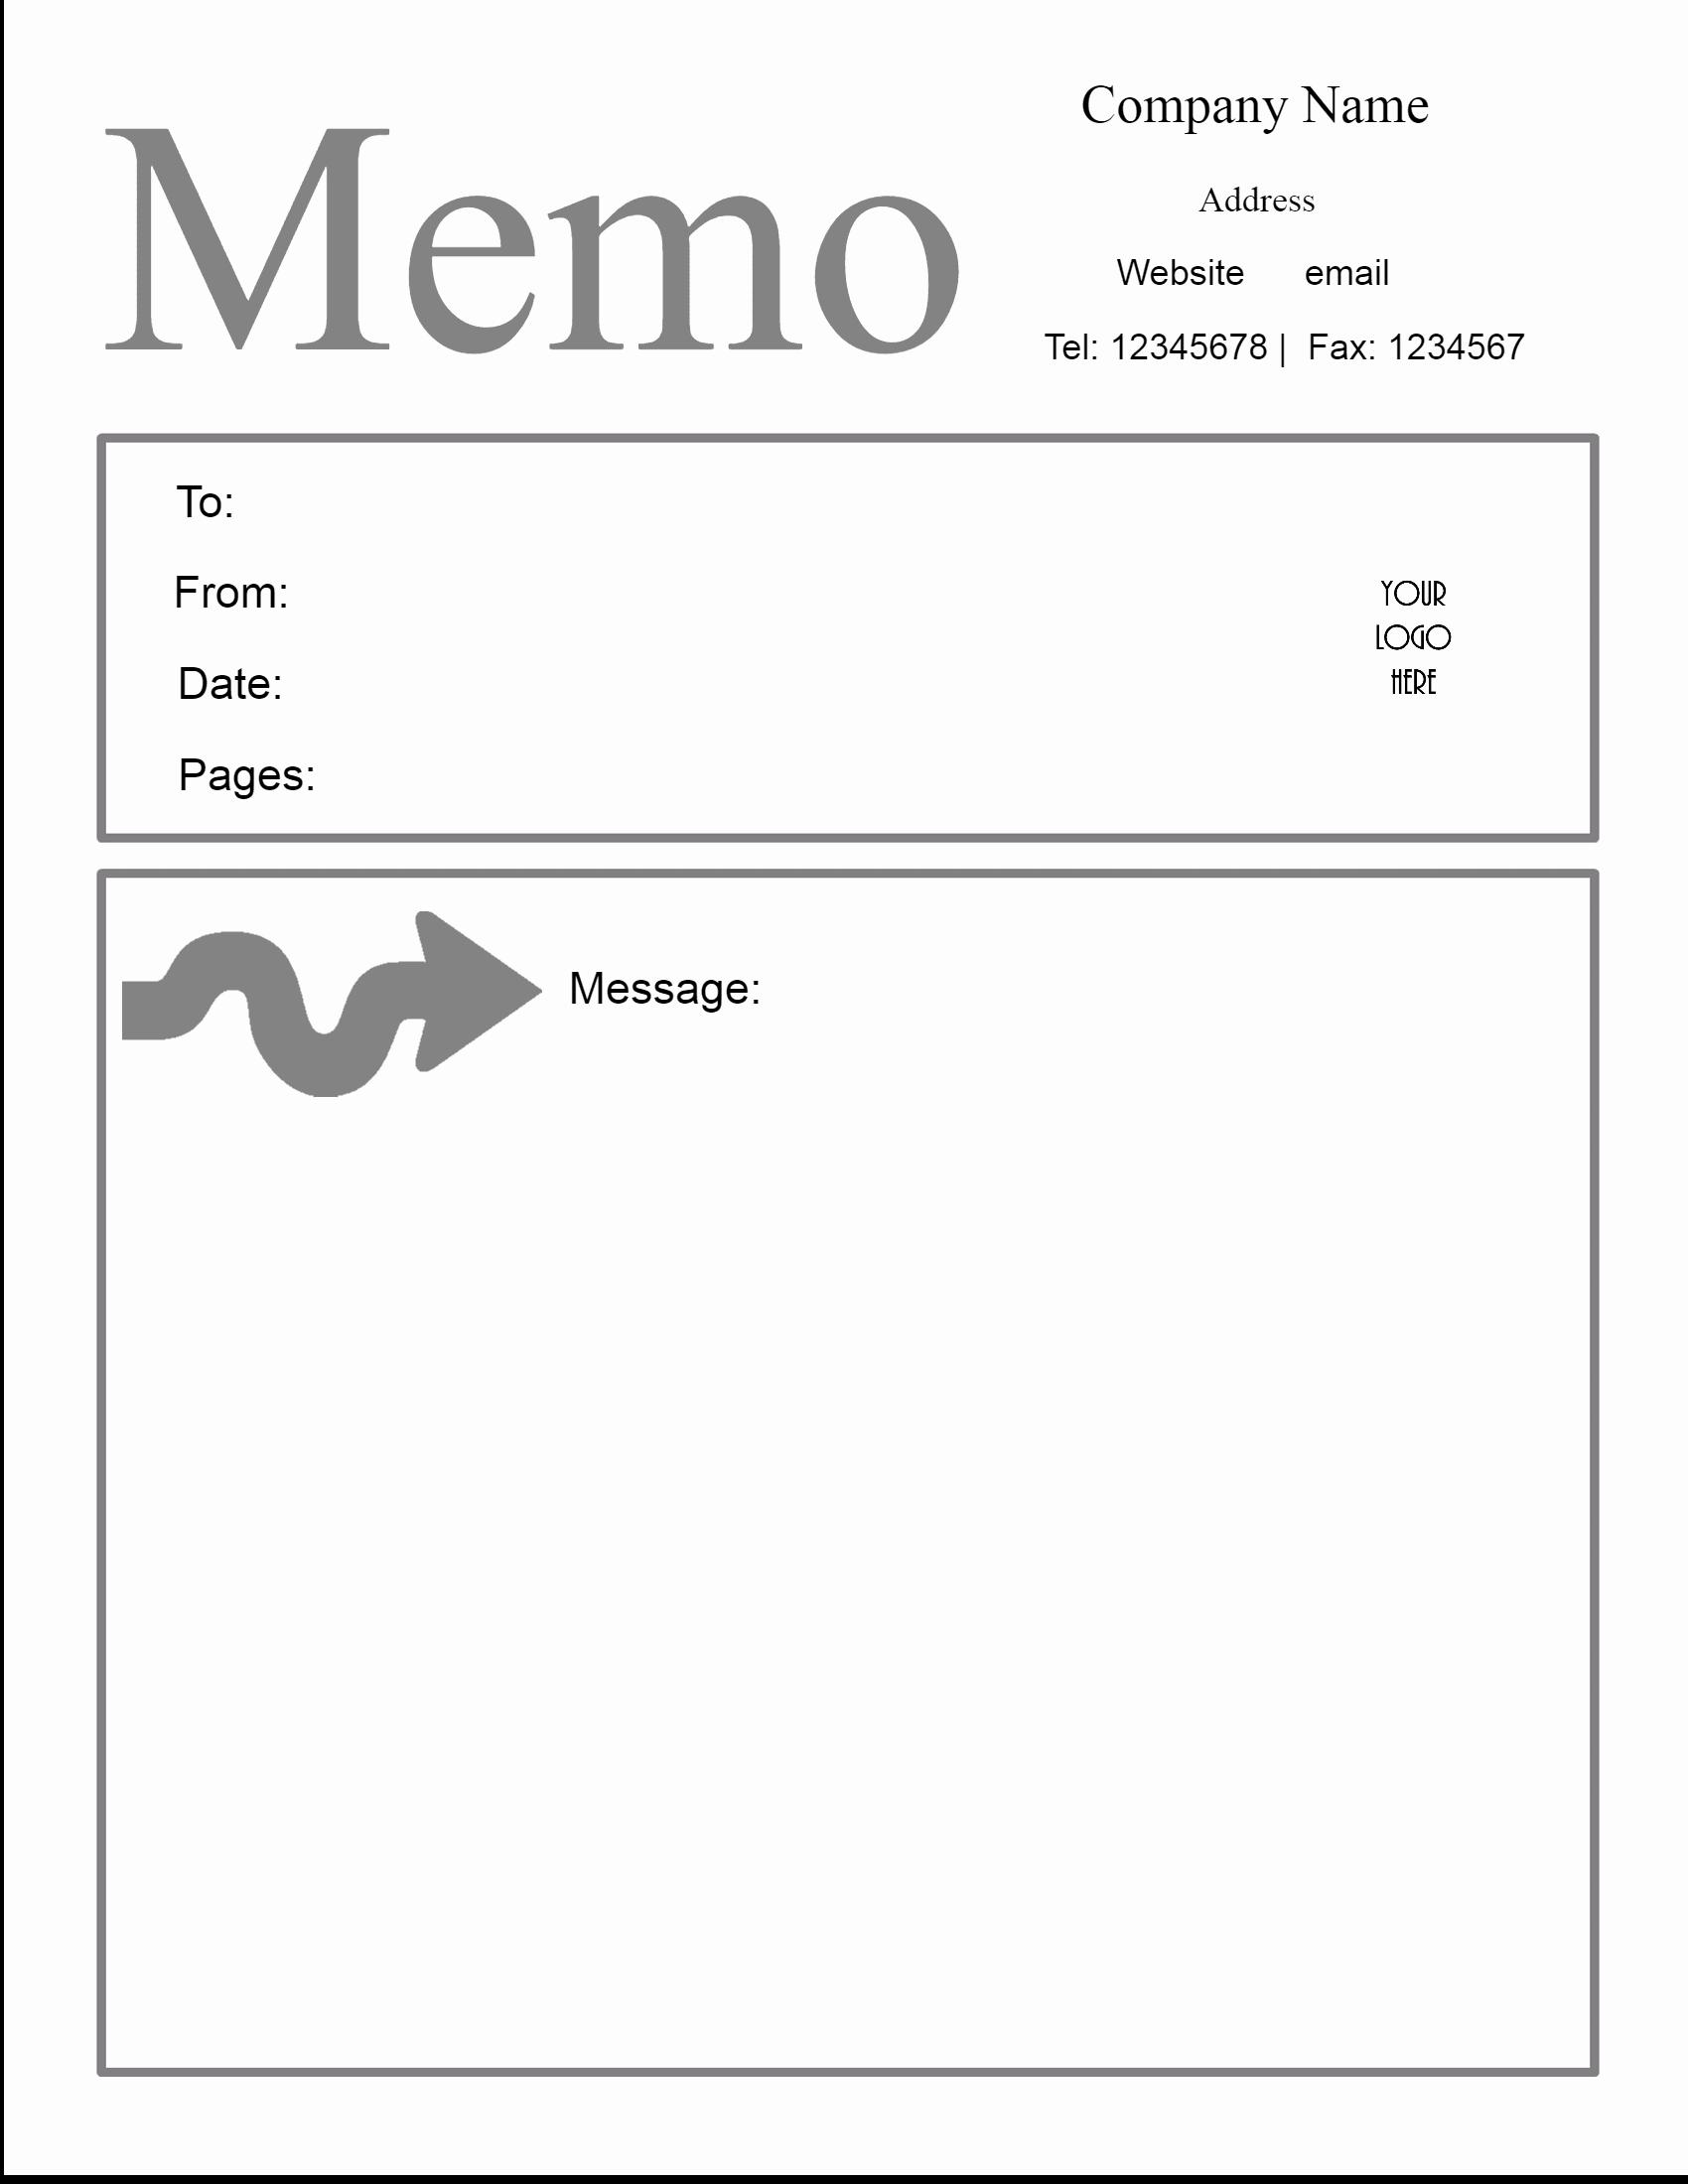 Memo Template for Word Inspirational Free Microsoft Word Memo Template